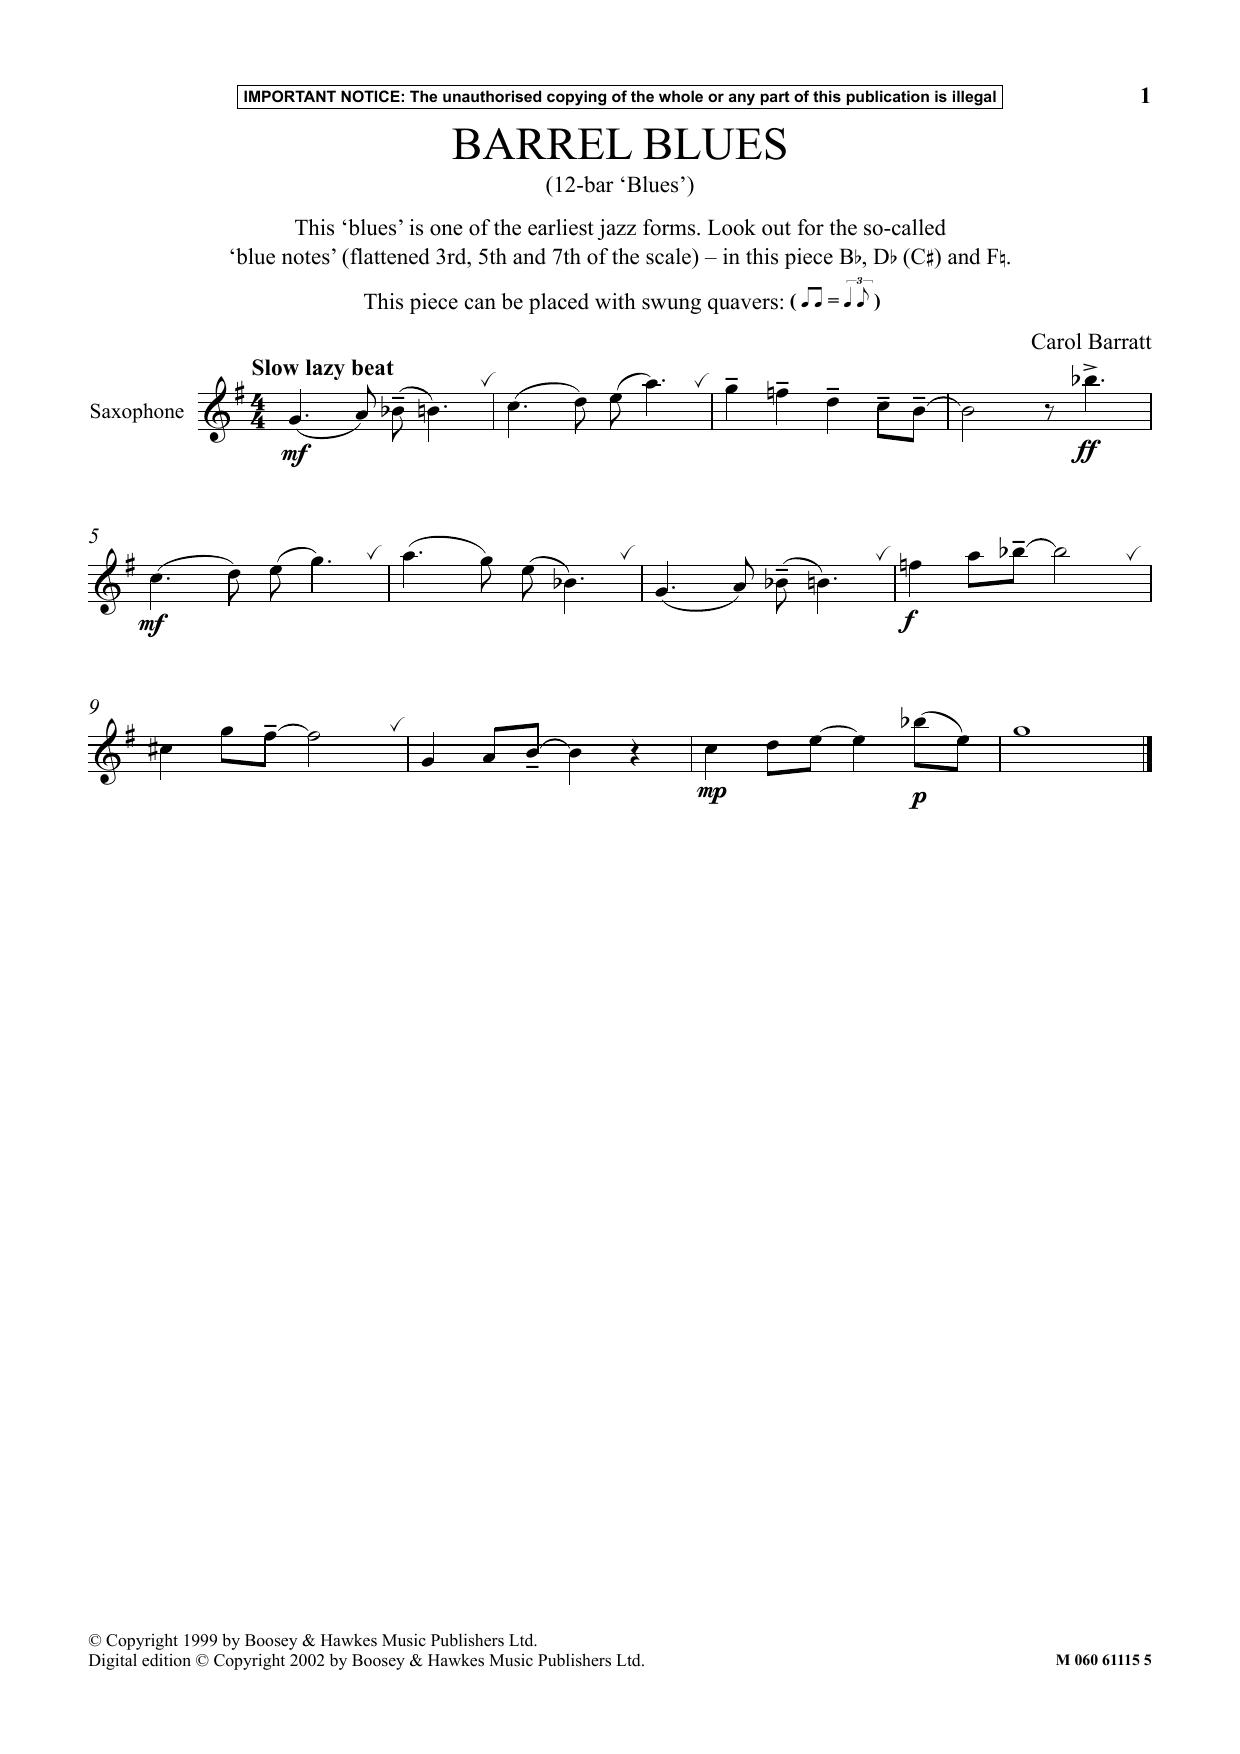 Barrel Blues Sheet Music